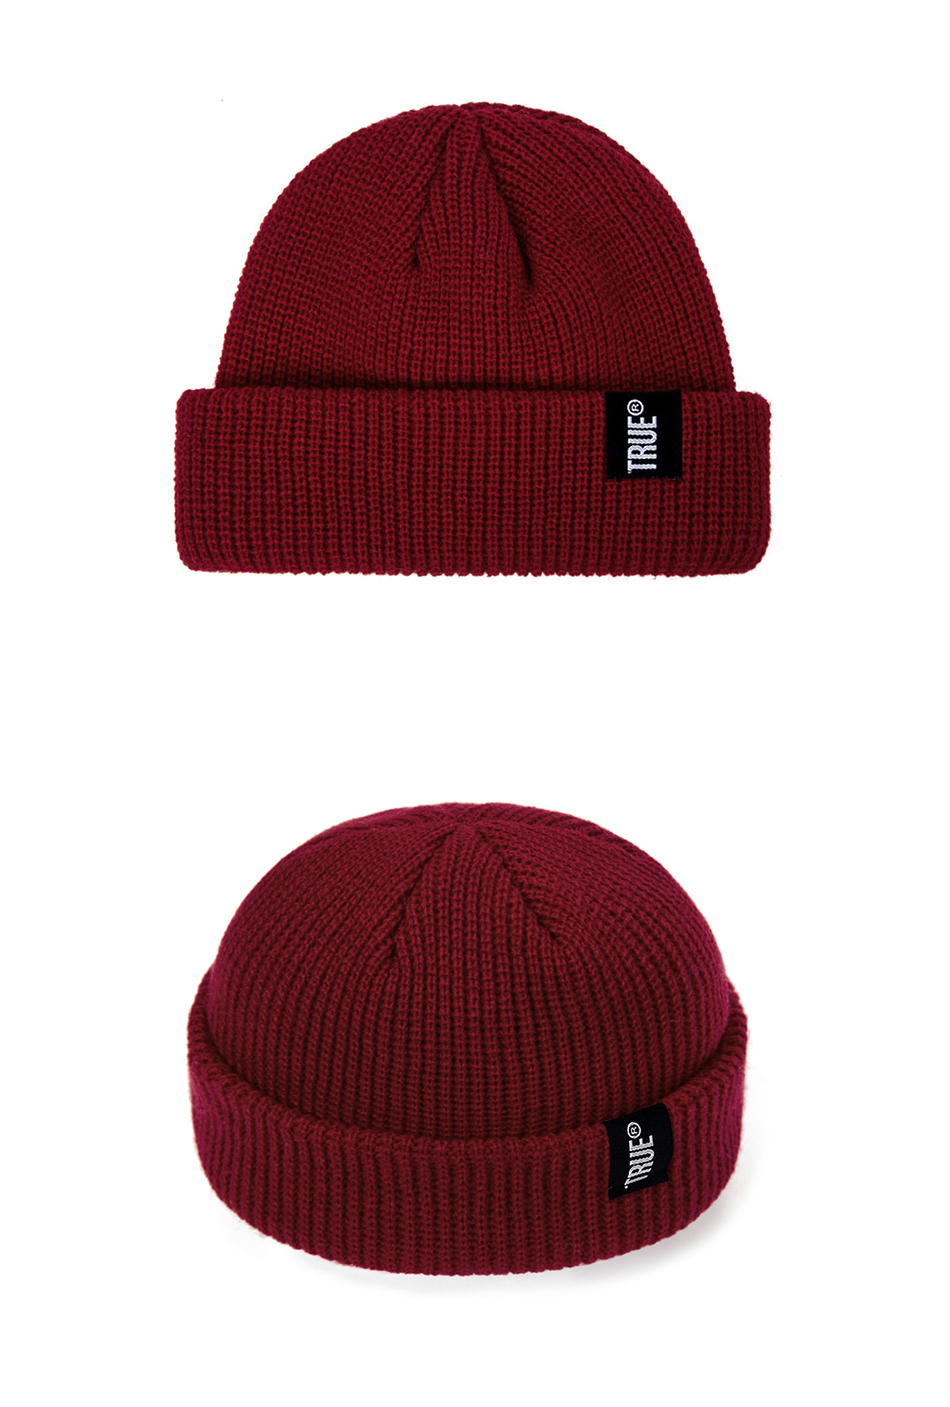 2019 Fashion Unisex Winter Hat Men Cuffed Cib Knit Hat Short Melon Ski Beanies Autumn Winter Solid Color Casual Beanie Hat 30